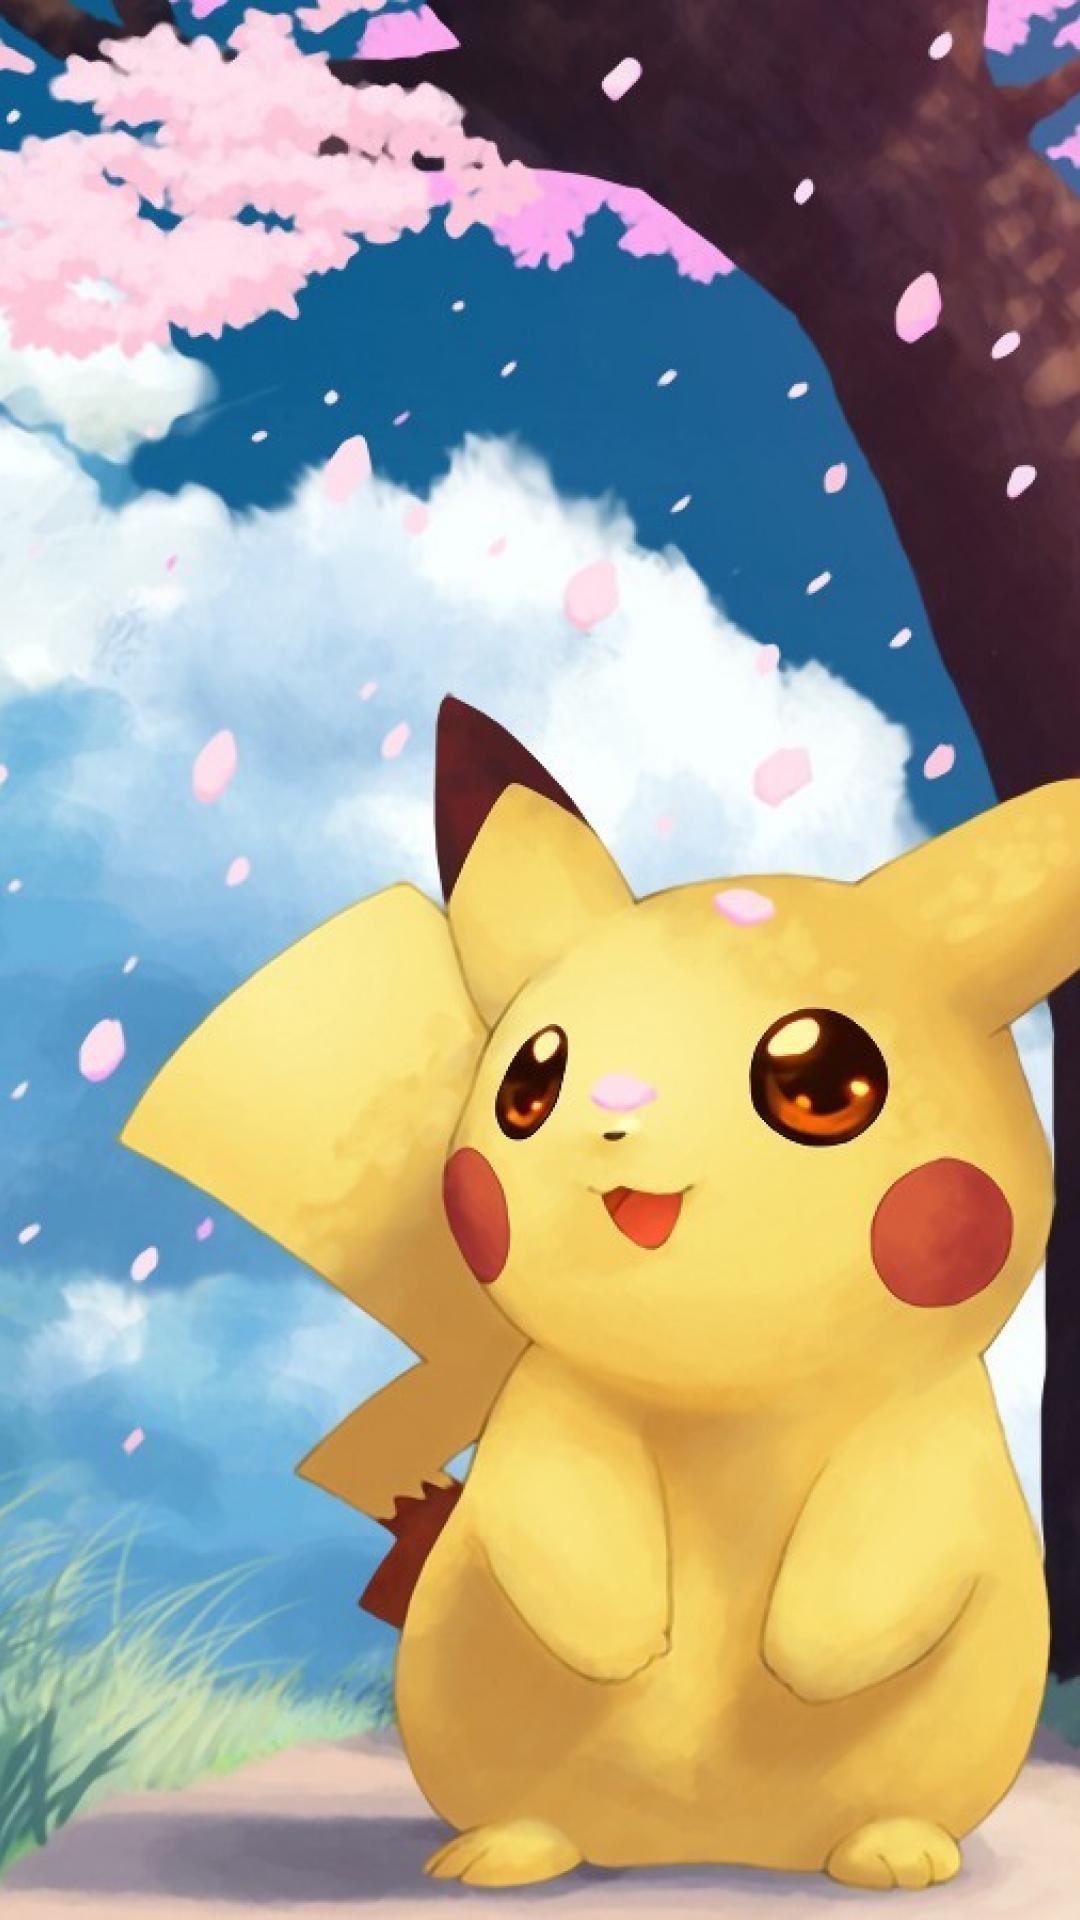 Adorable Pokemon wallpapers and gifs